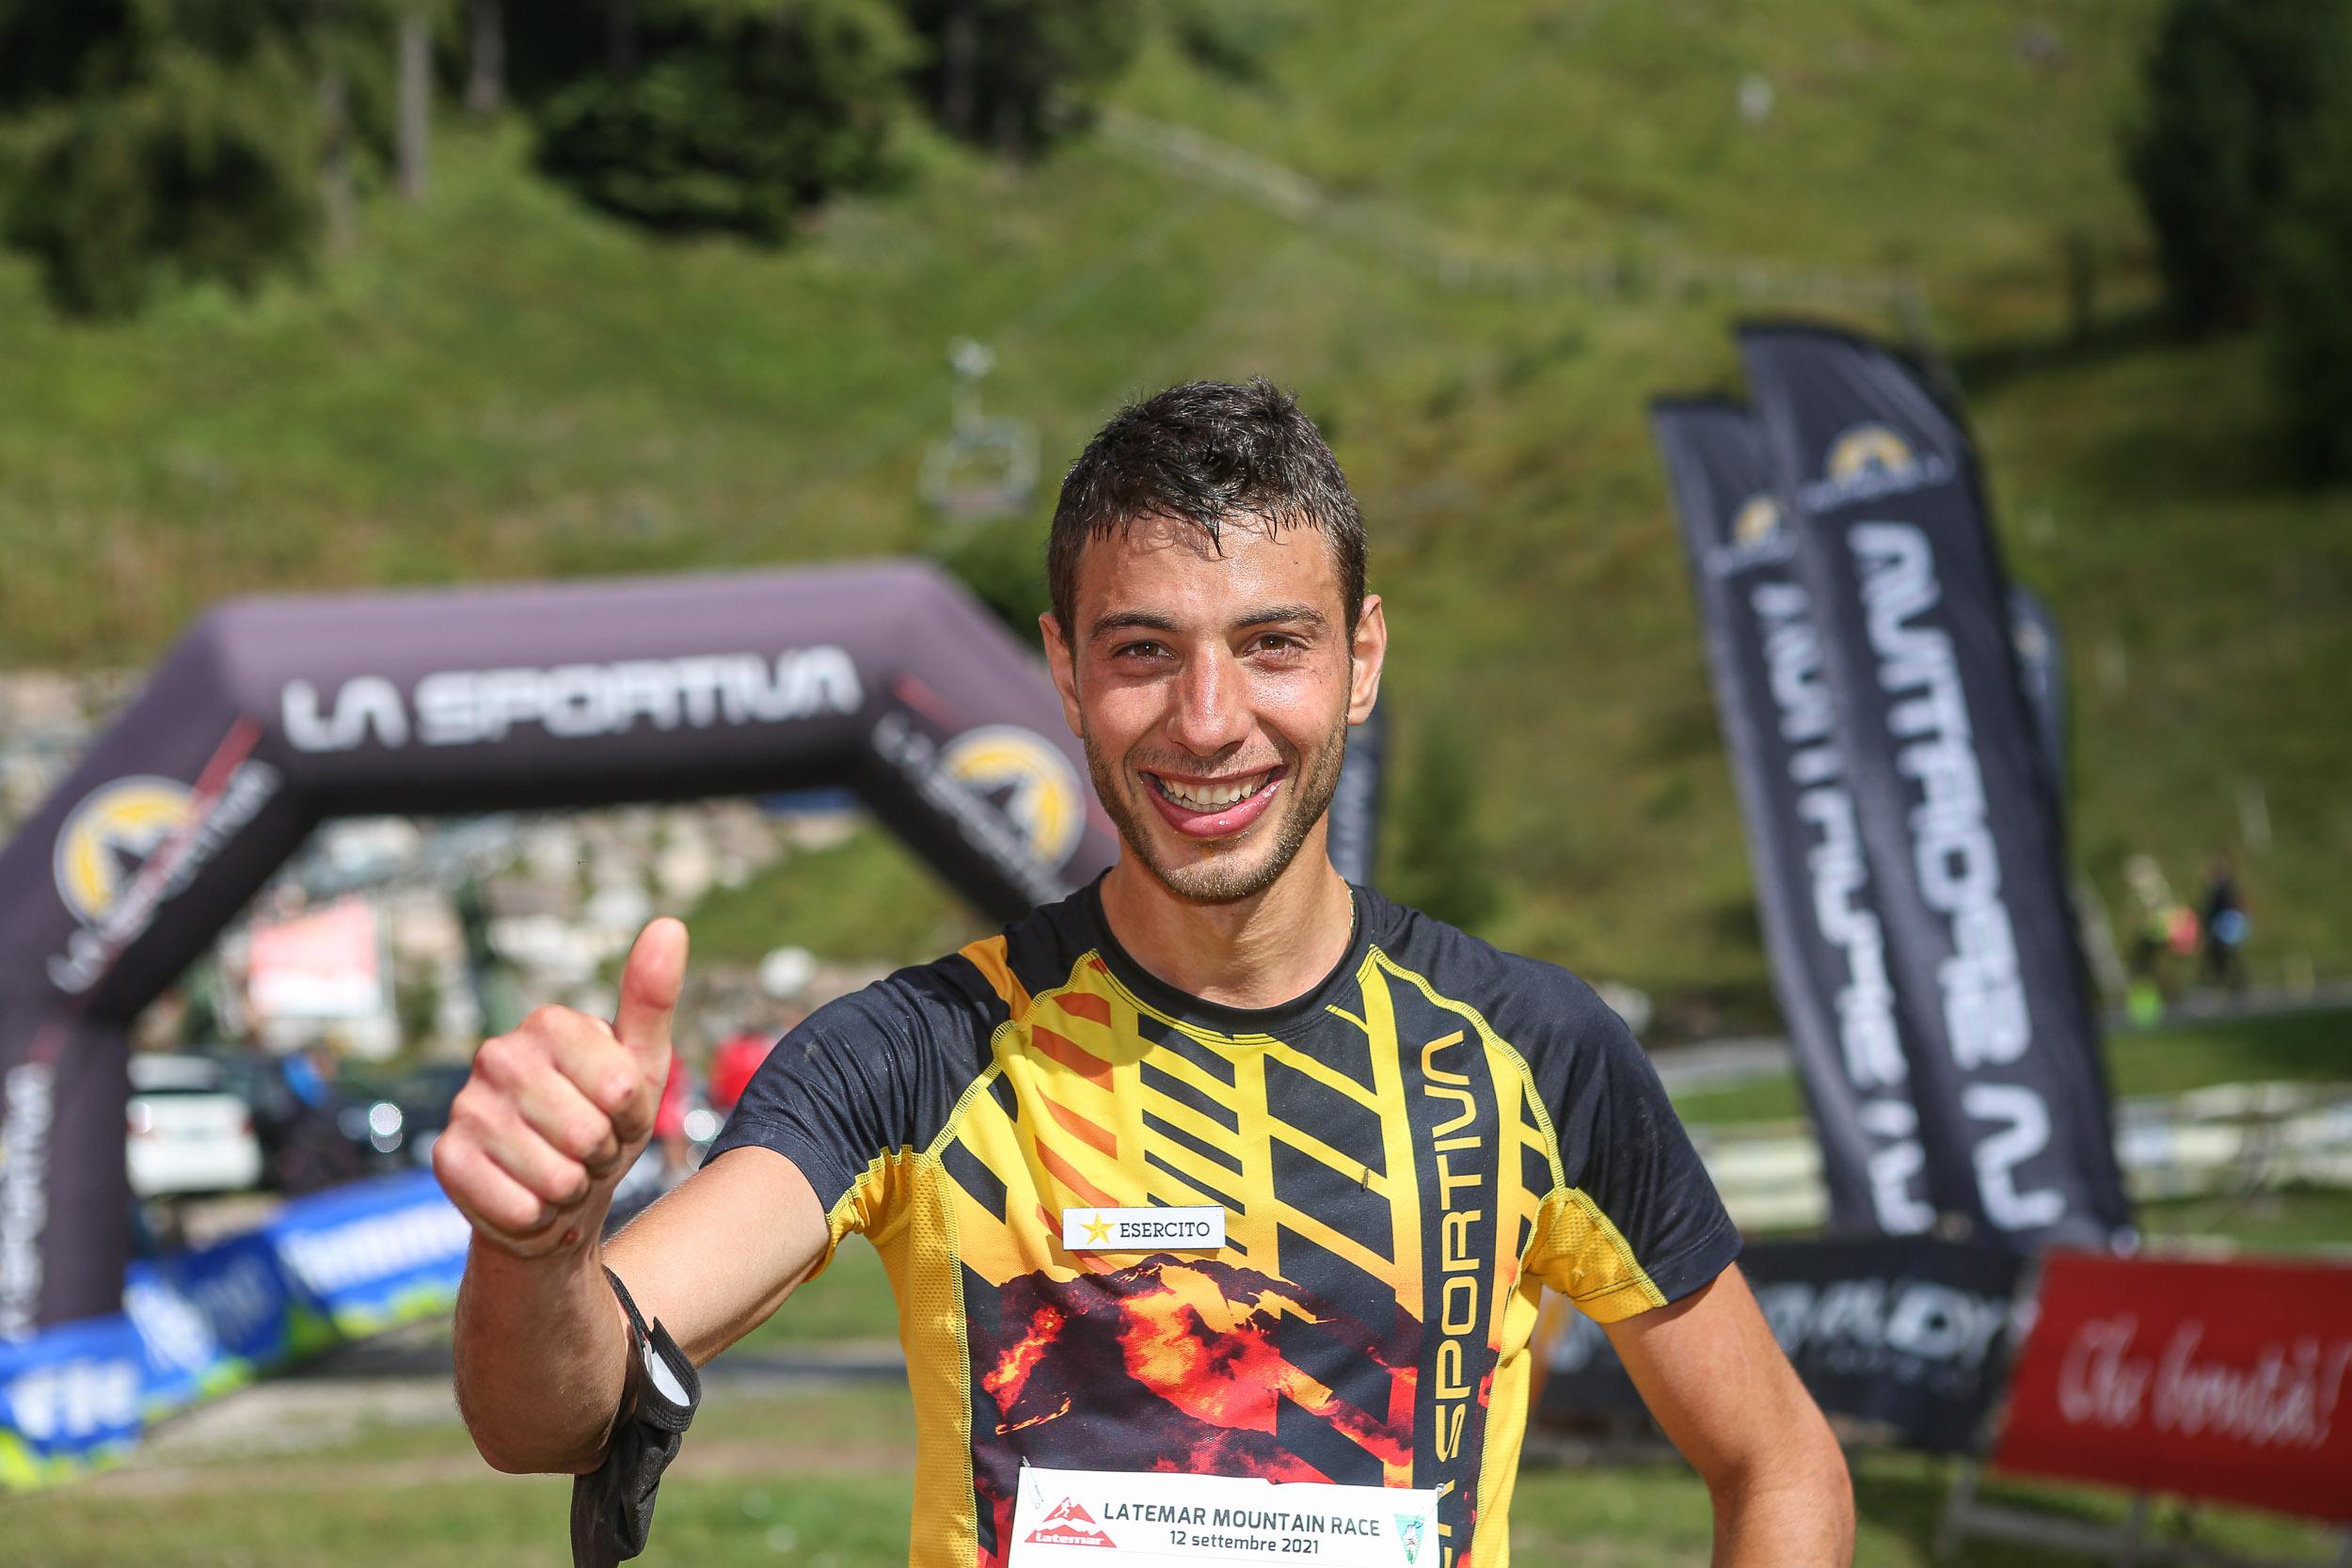 Nadir Maguet vince la Latemar Mountain Race 2021